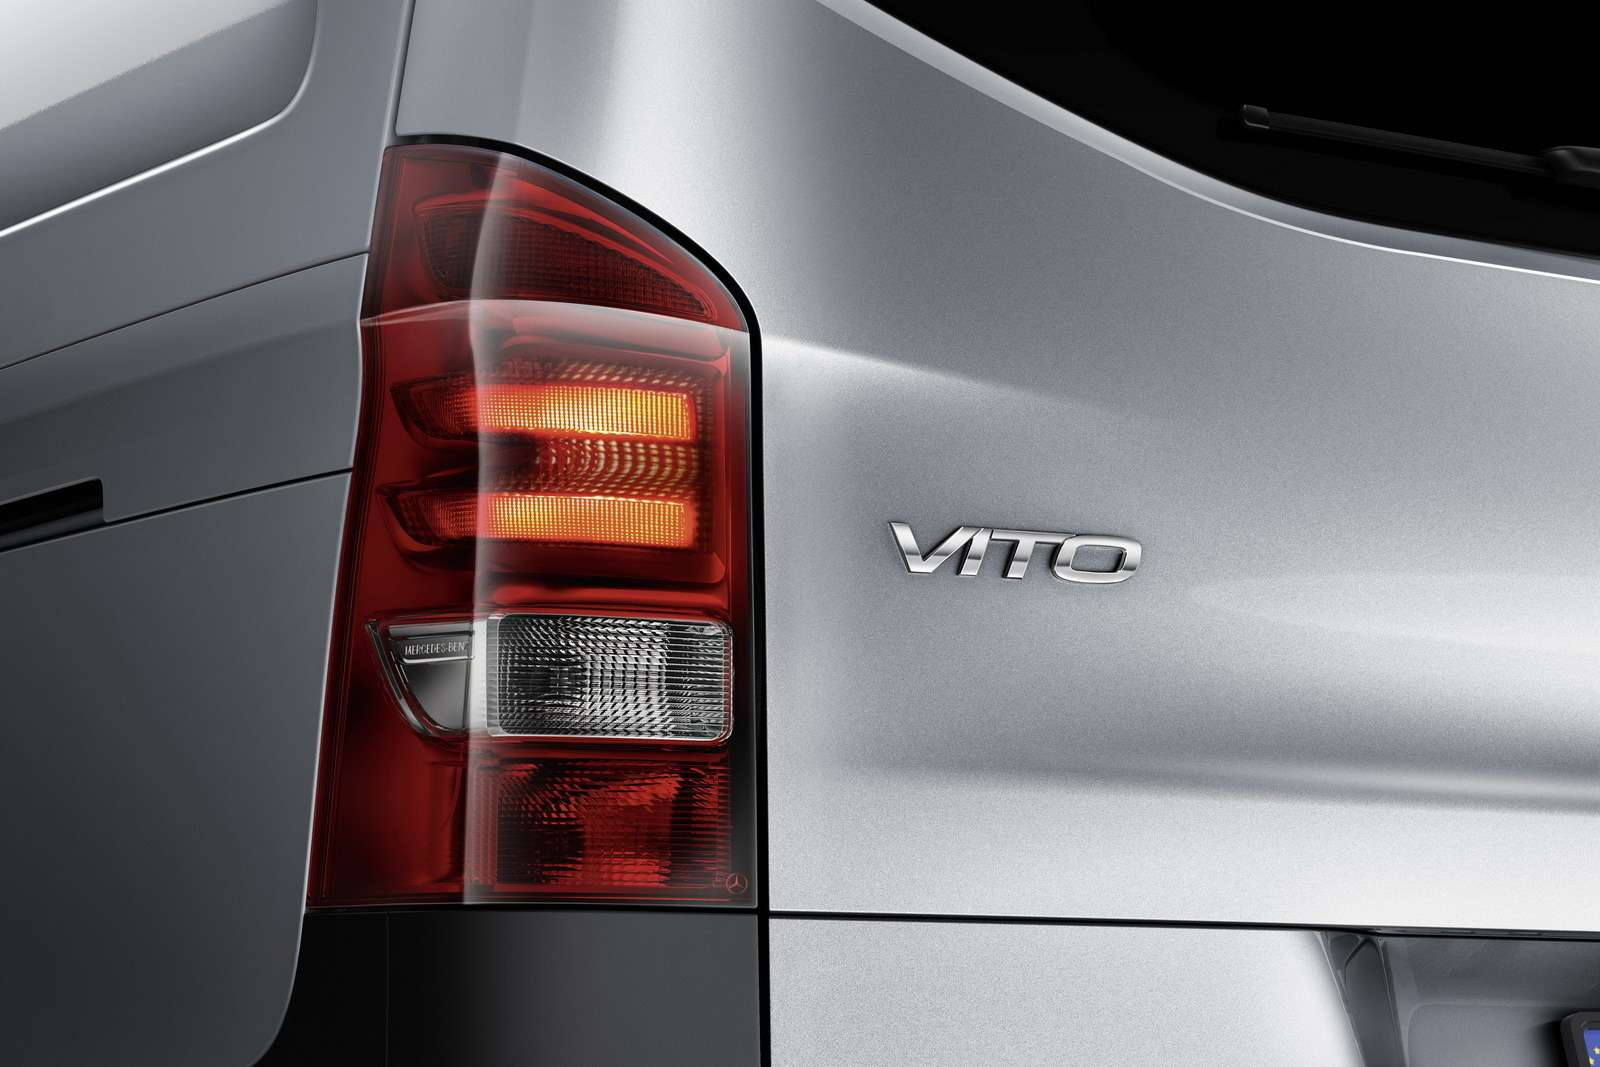 Derneue Vito— HeckleuchteDer neue Vito— rear lamp